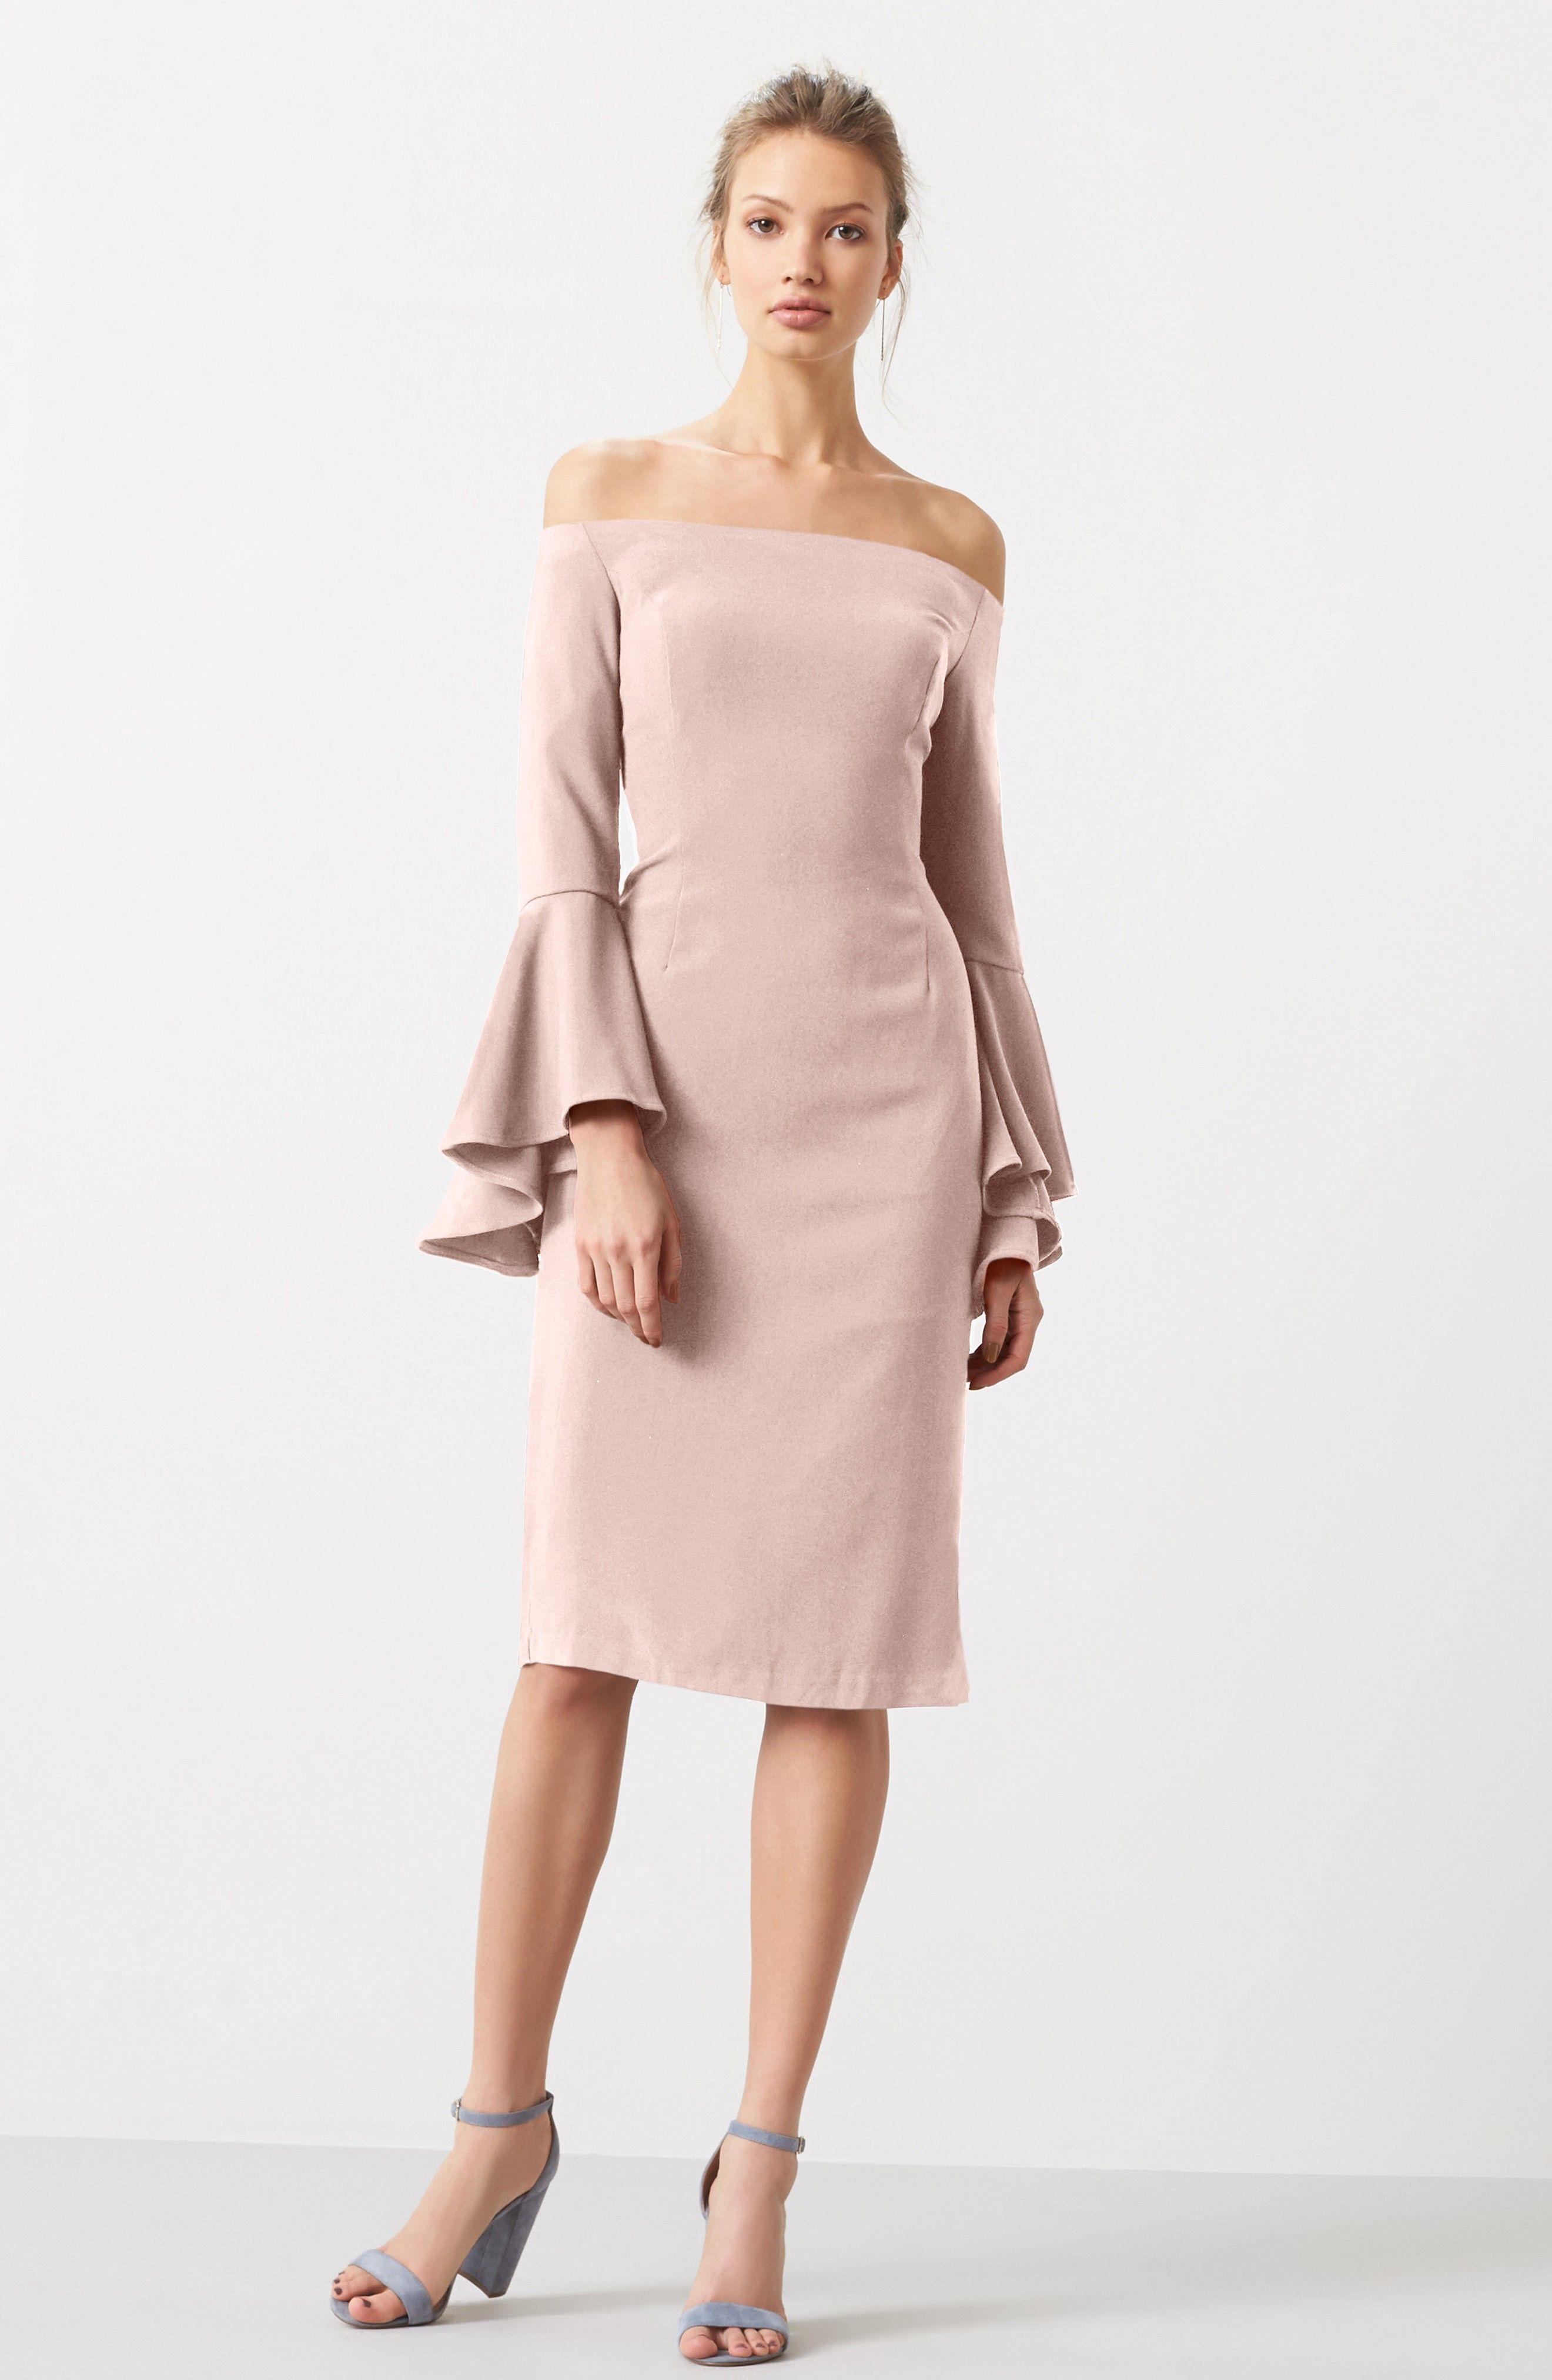 Fall Favorite: Blush | Fashion | Pinterest | Vestidos cortos y ...